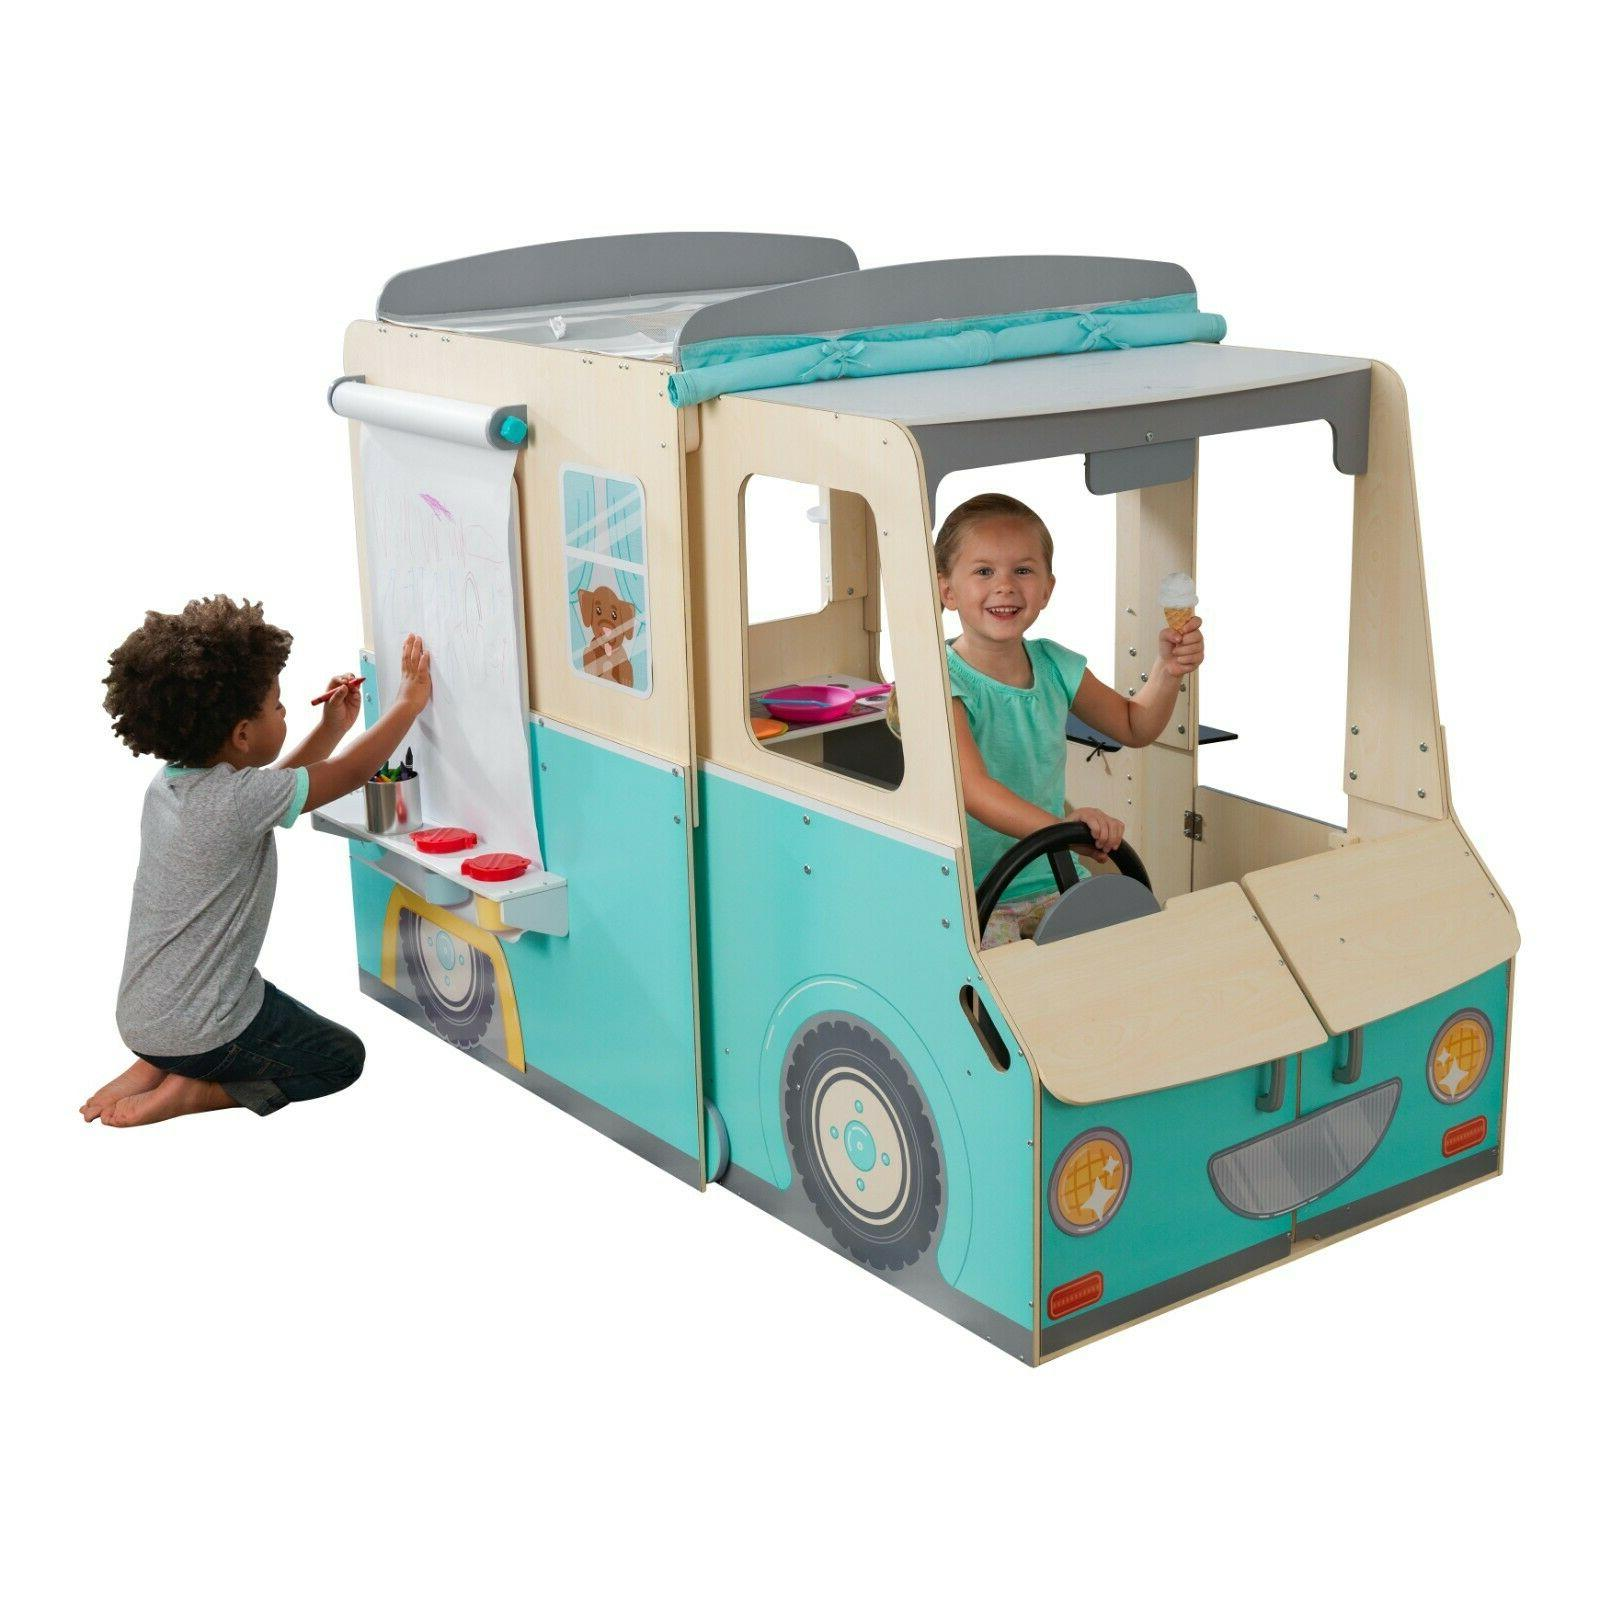 wondervan indoor playhouse with art center play